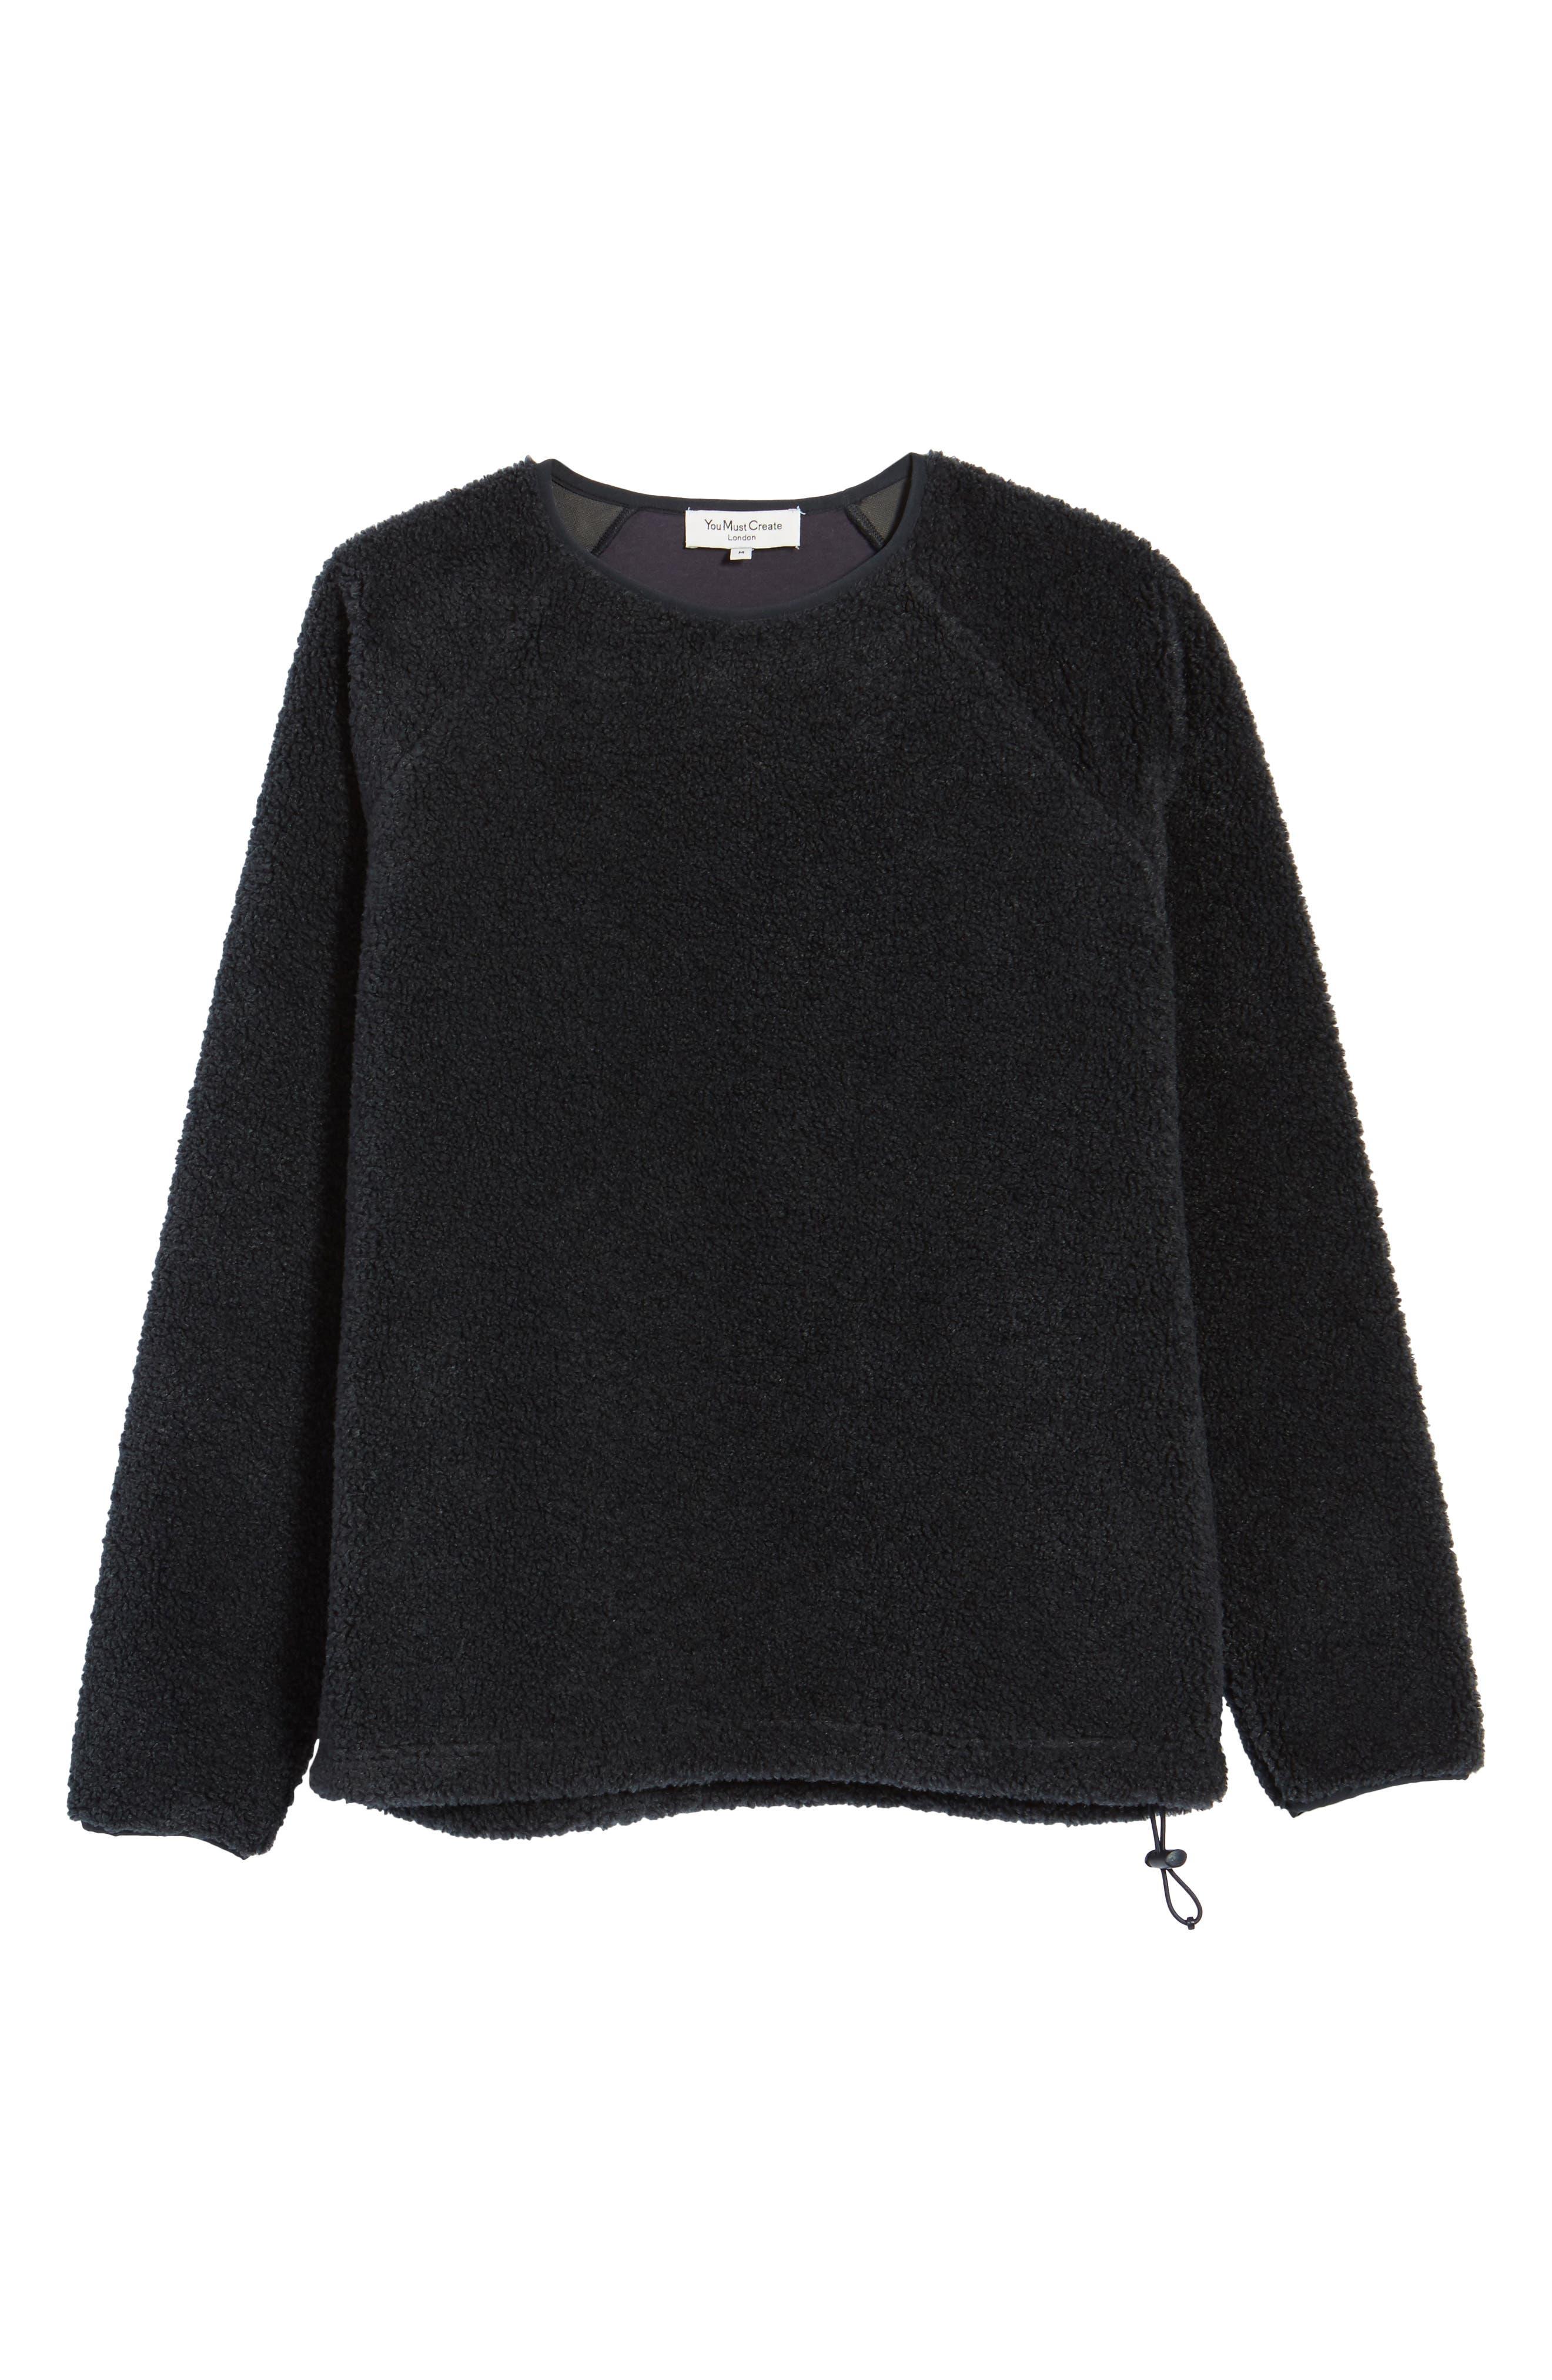 Deliverance Fleece Sweatshirt,                             Alternate thumbnail 6, color,